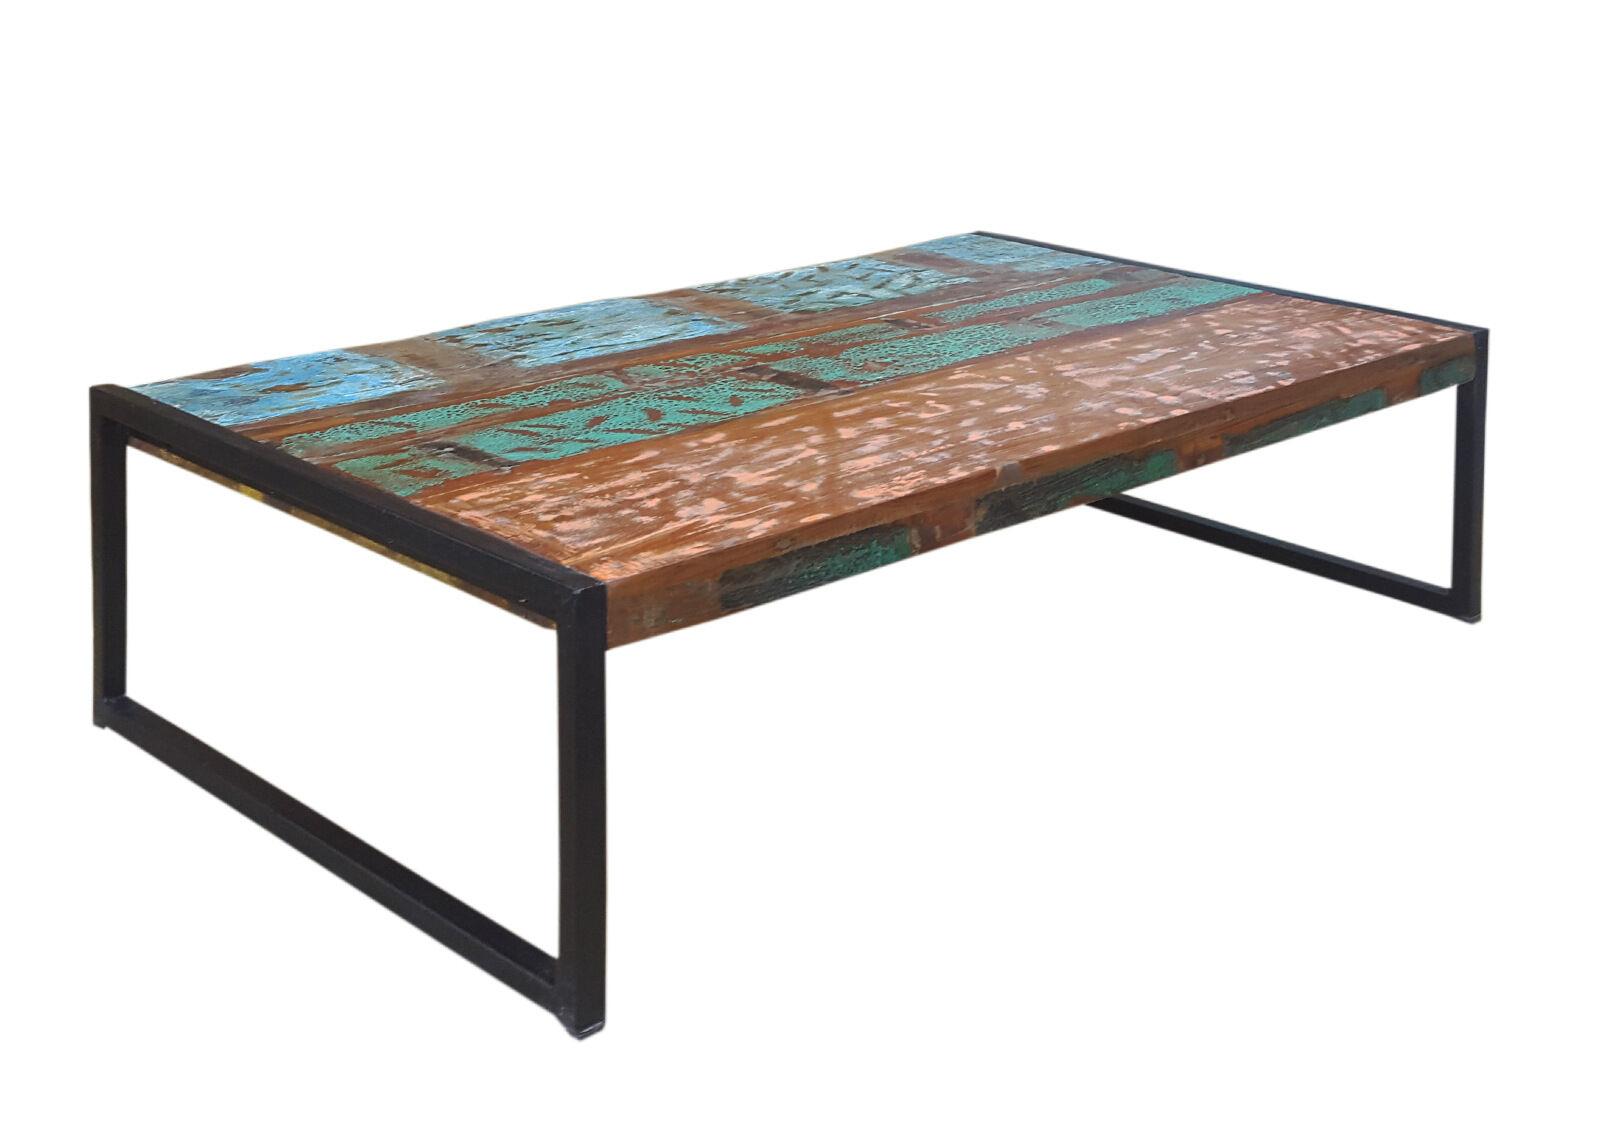 SIT Möbel Sohvapöytä BALI 115x70 cm